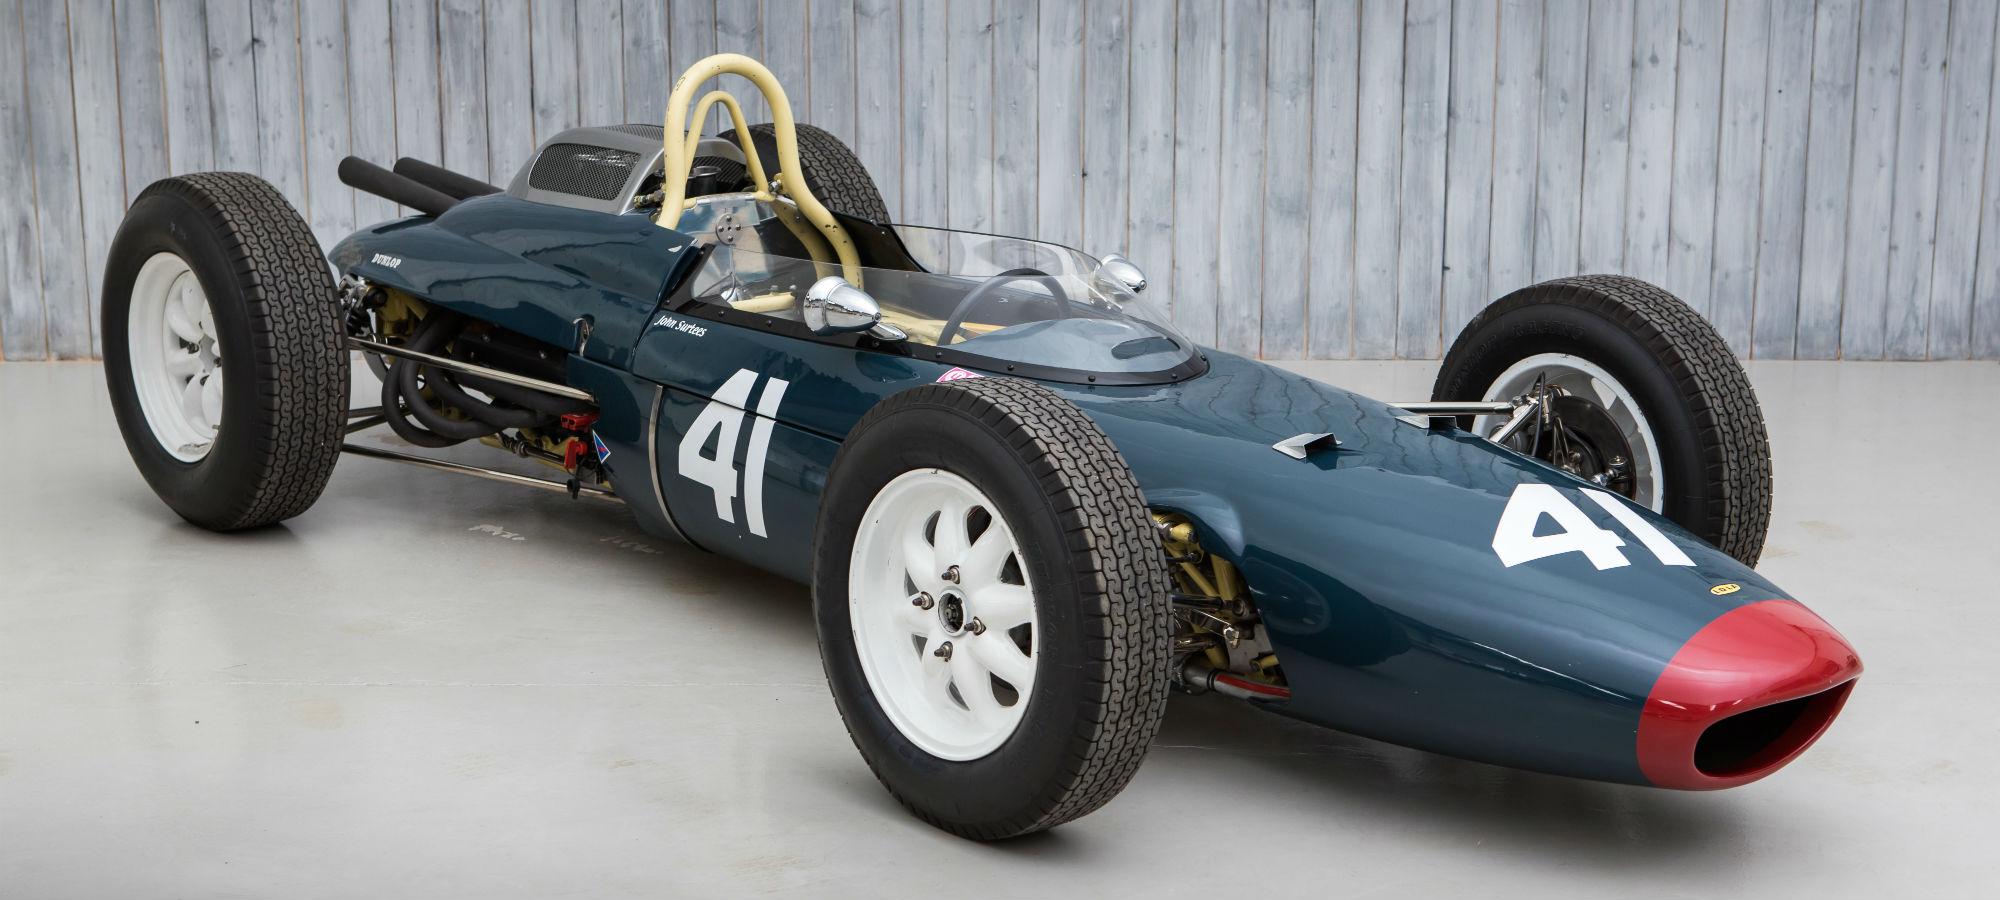 The Ex - John Surtees 1962 Lola Mk4 Formula 1